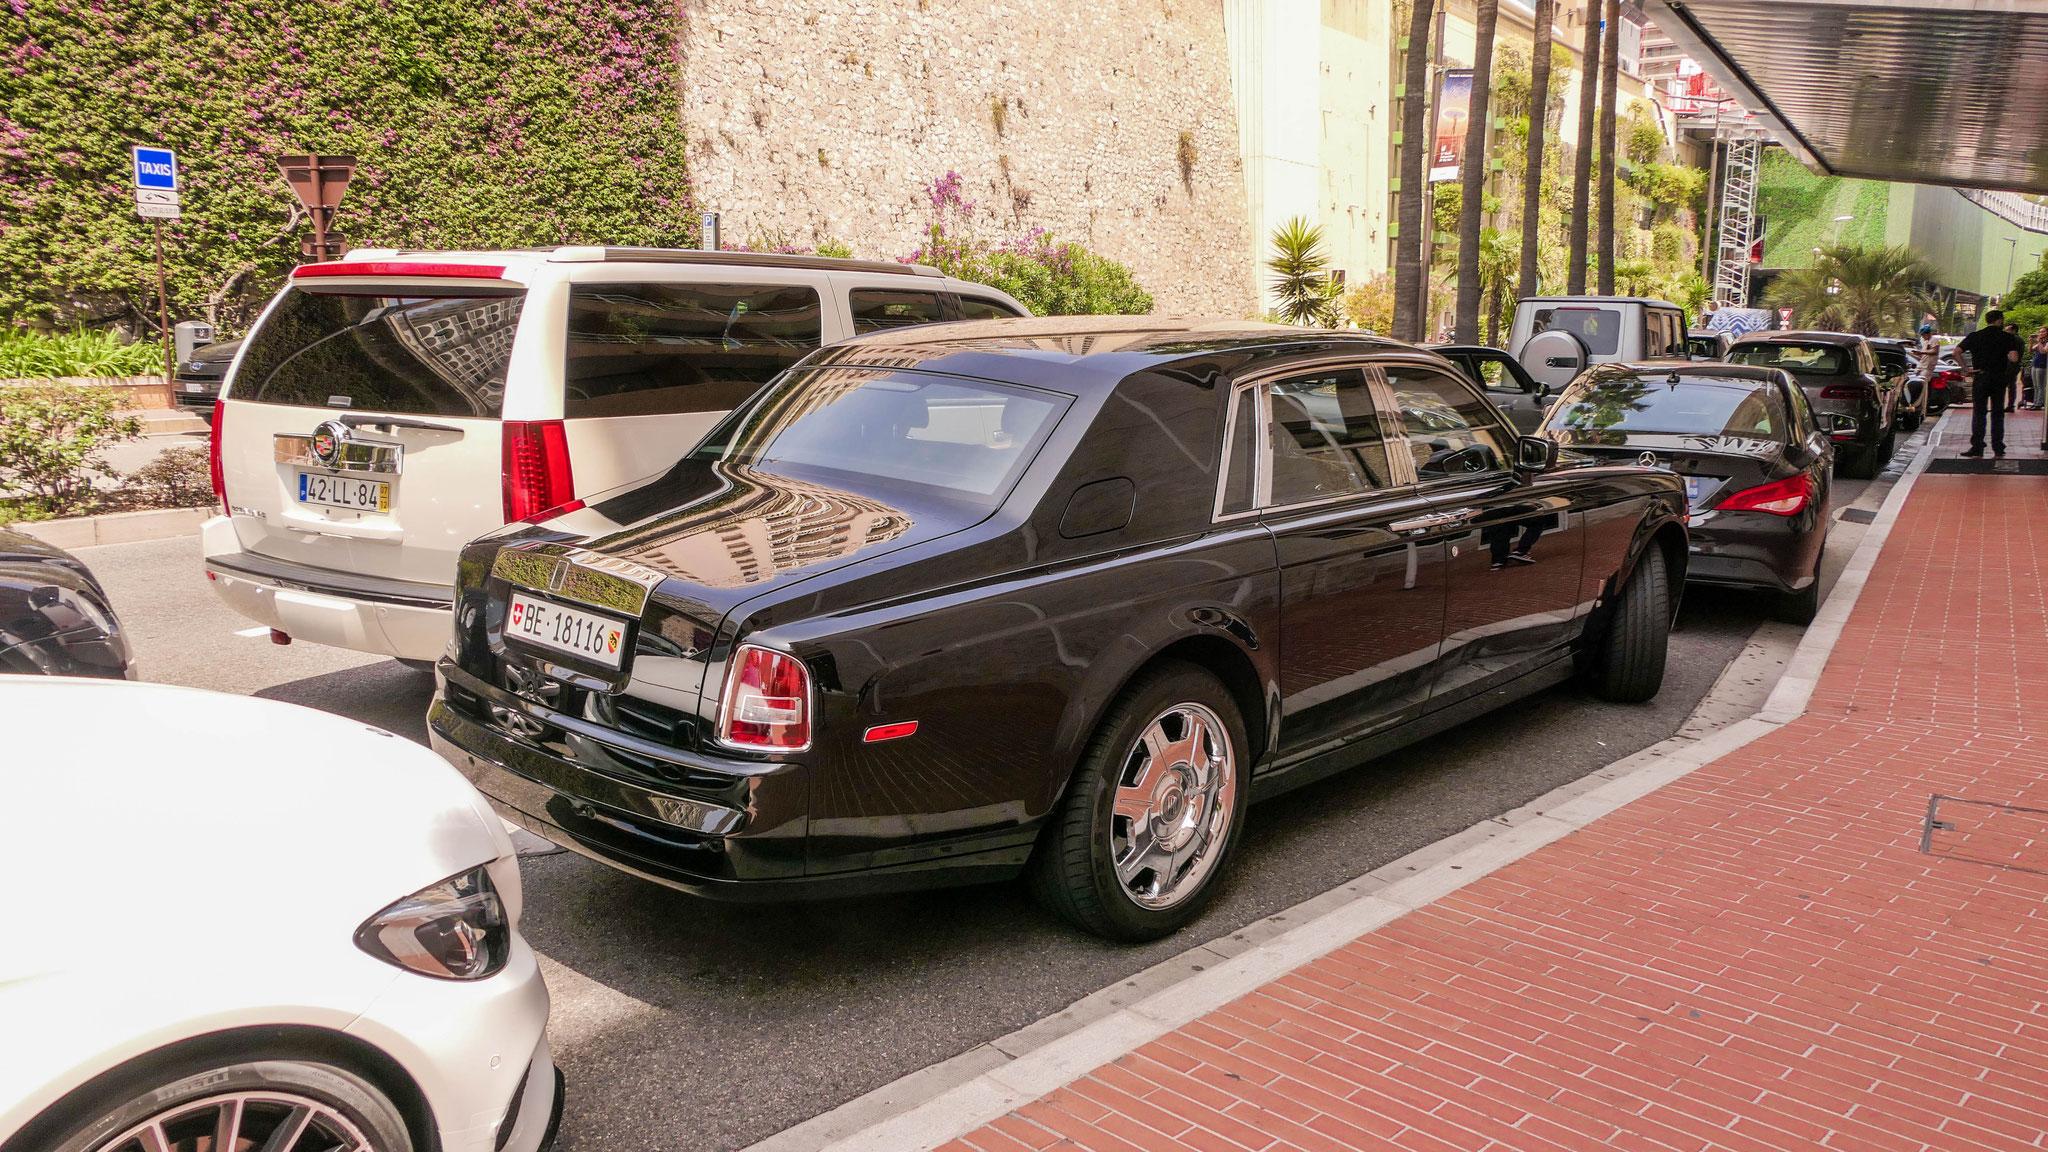 Rolls Royce Phantom - BE-18116 (CH)